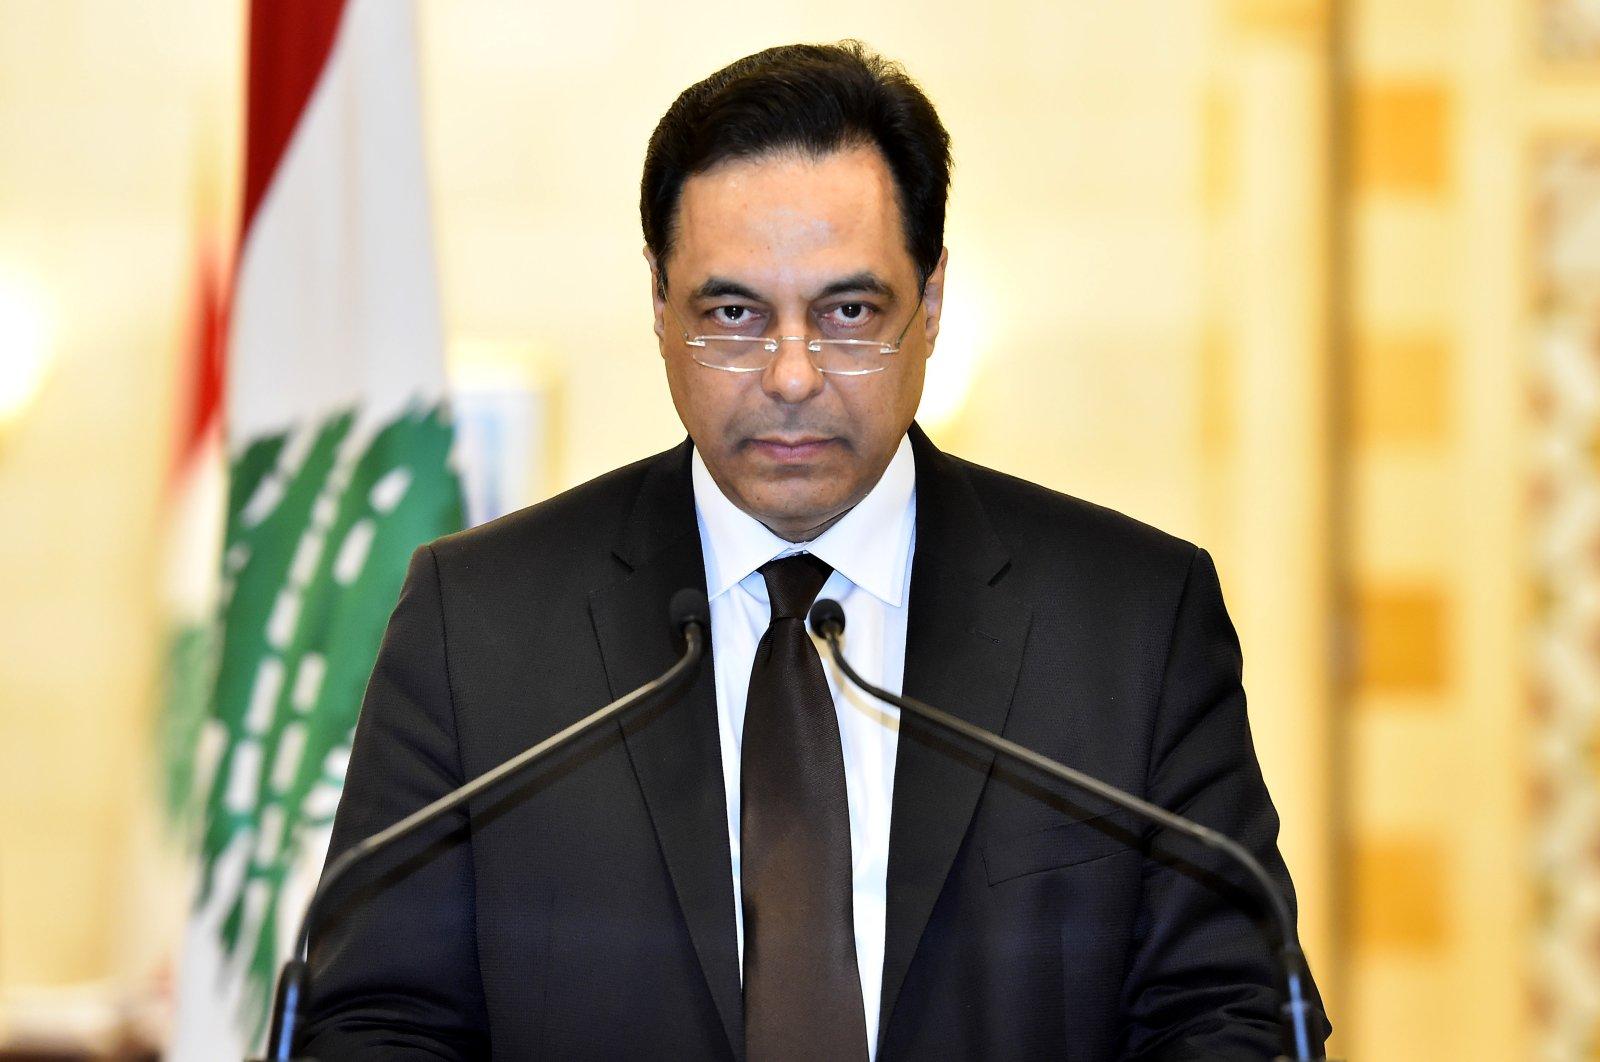 Lebanese Prime Minister Hassan Diab delivers a resignation speech, Beirut, Lebanon, Aug. 10, 2020.  (EPA Photo)